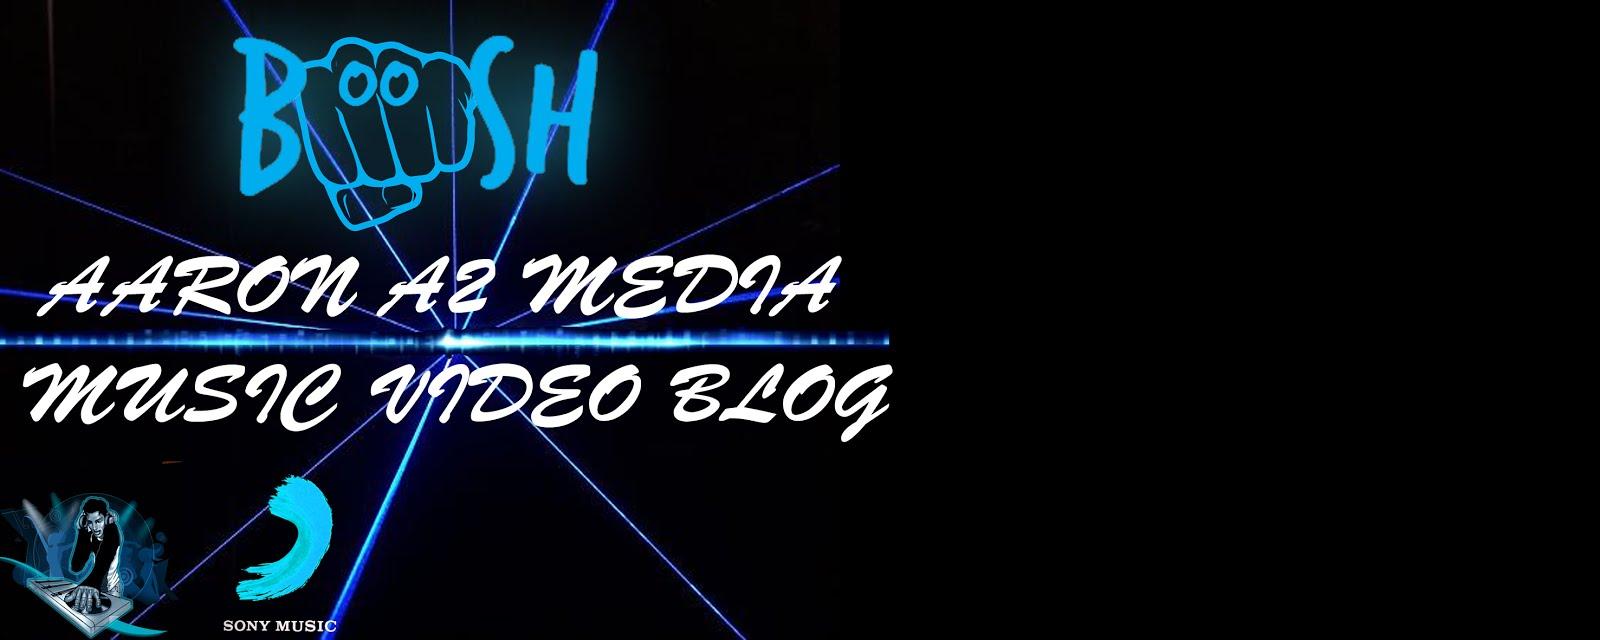 Aaron's A2 Media Blog